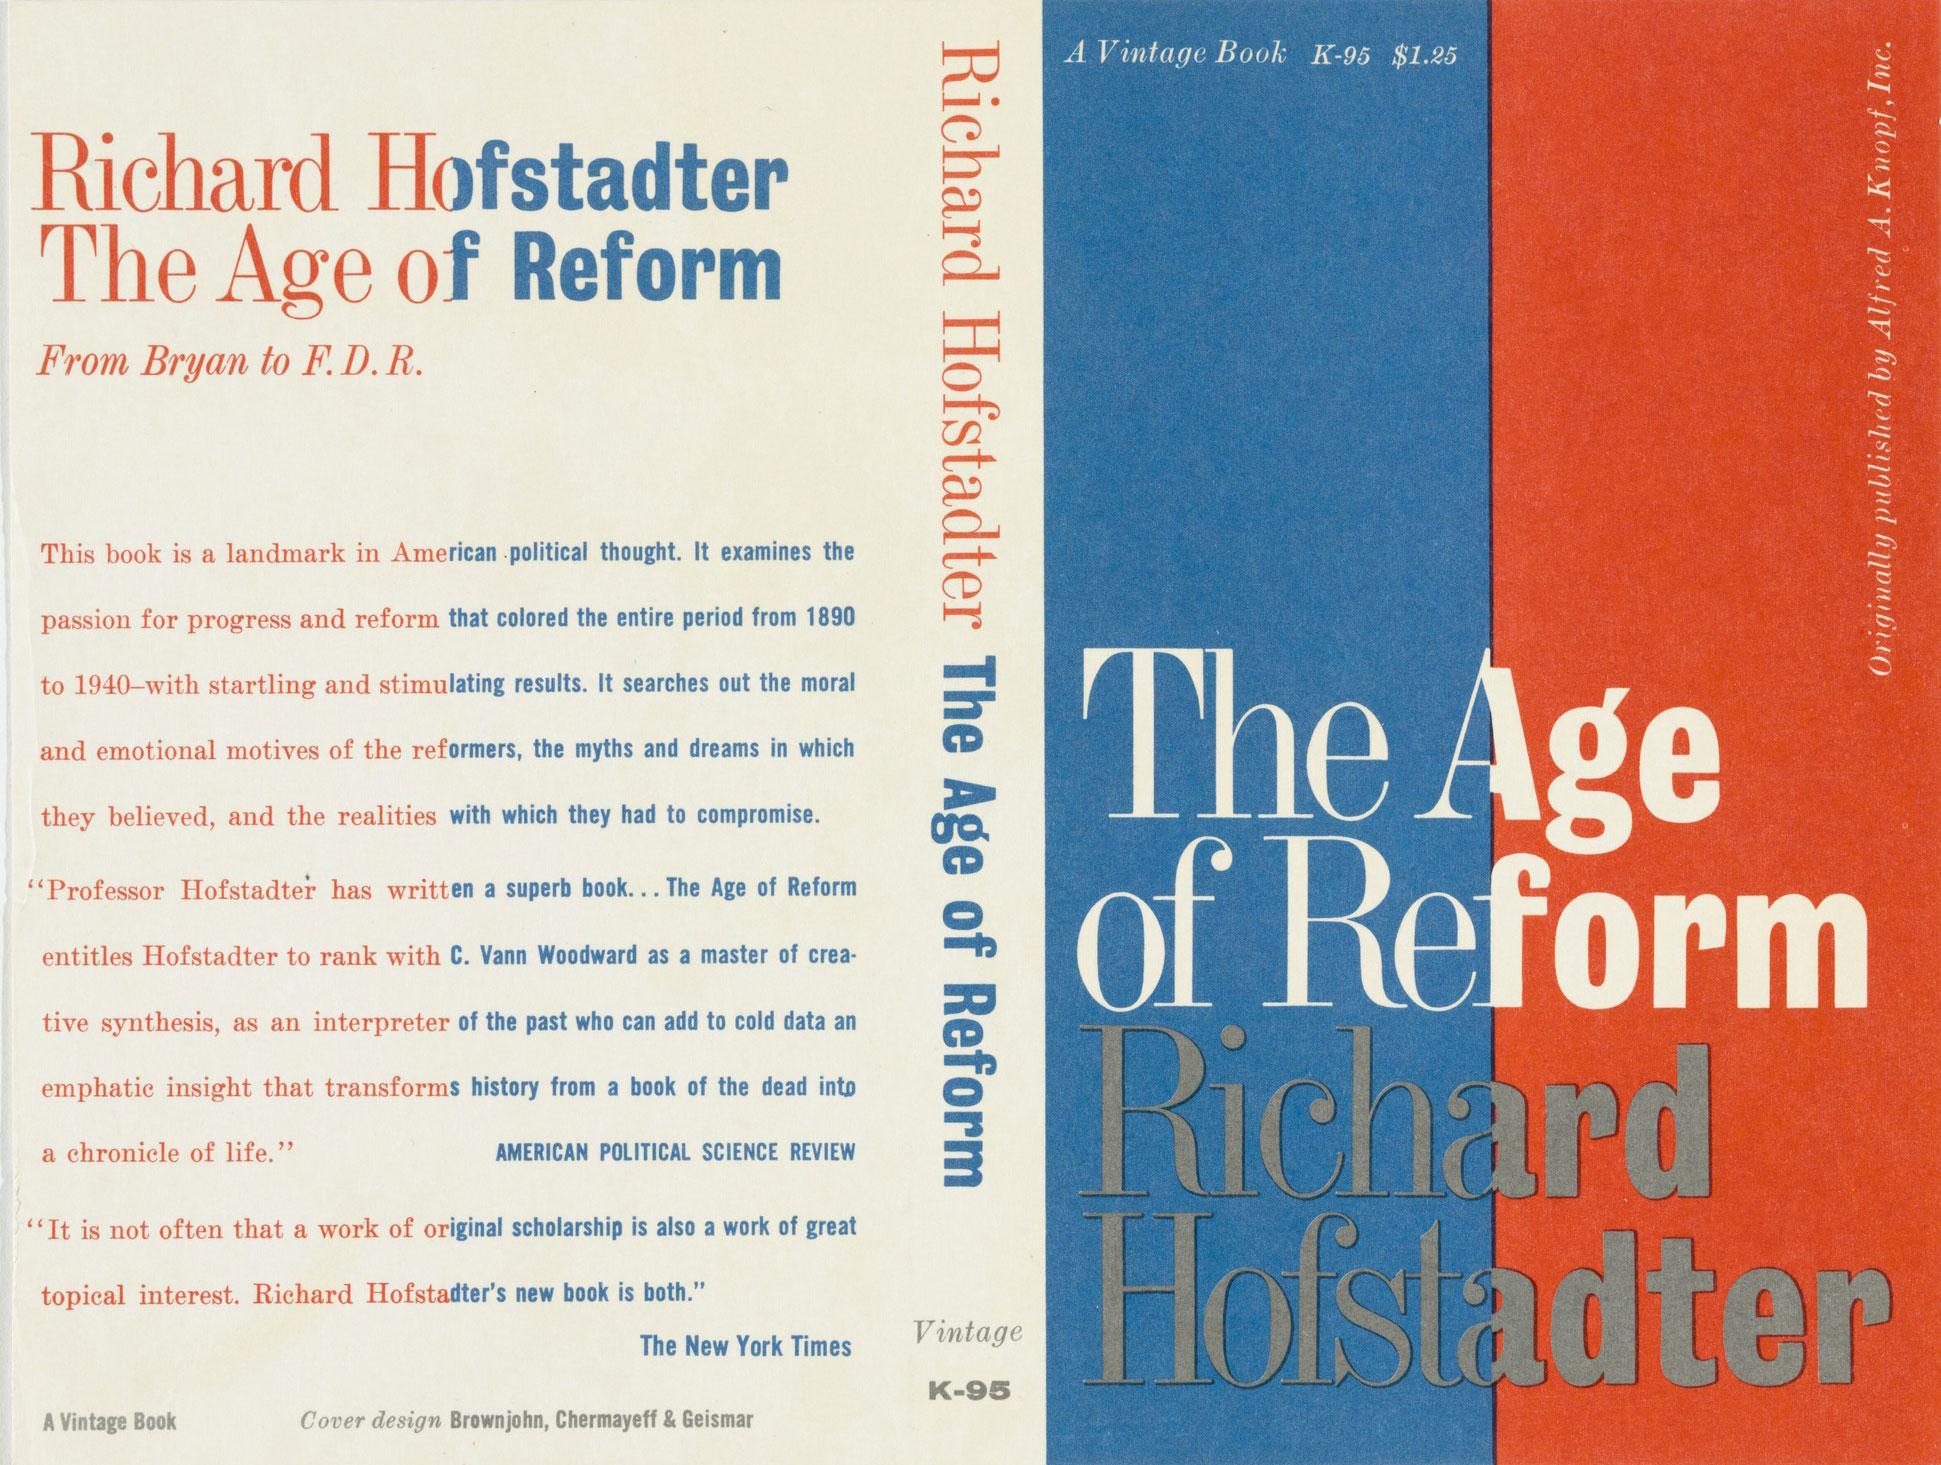 Chermayeff-and-Geismar-couverture-livre-The-Age-of-Reform-1955